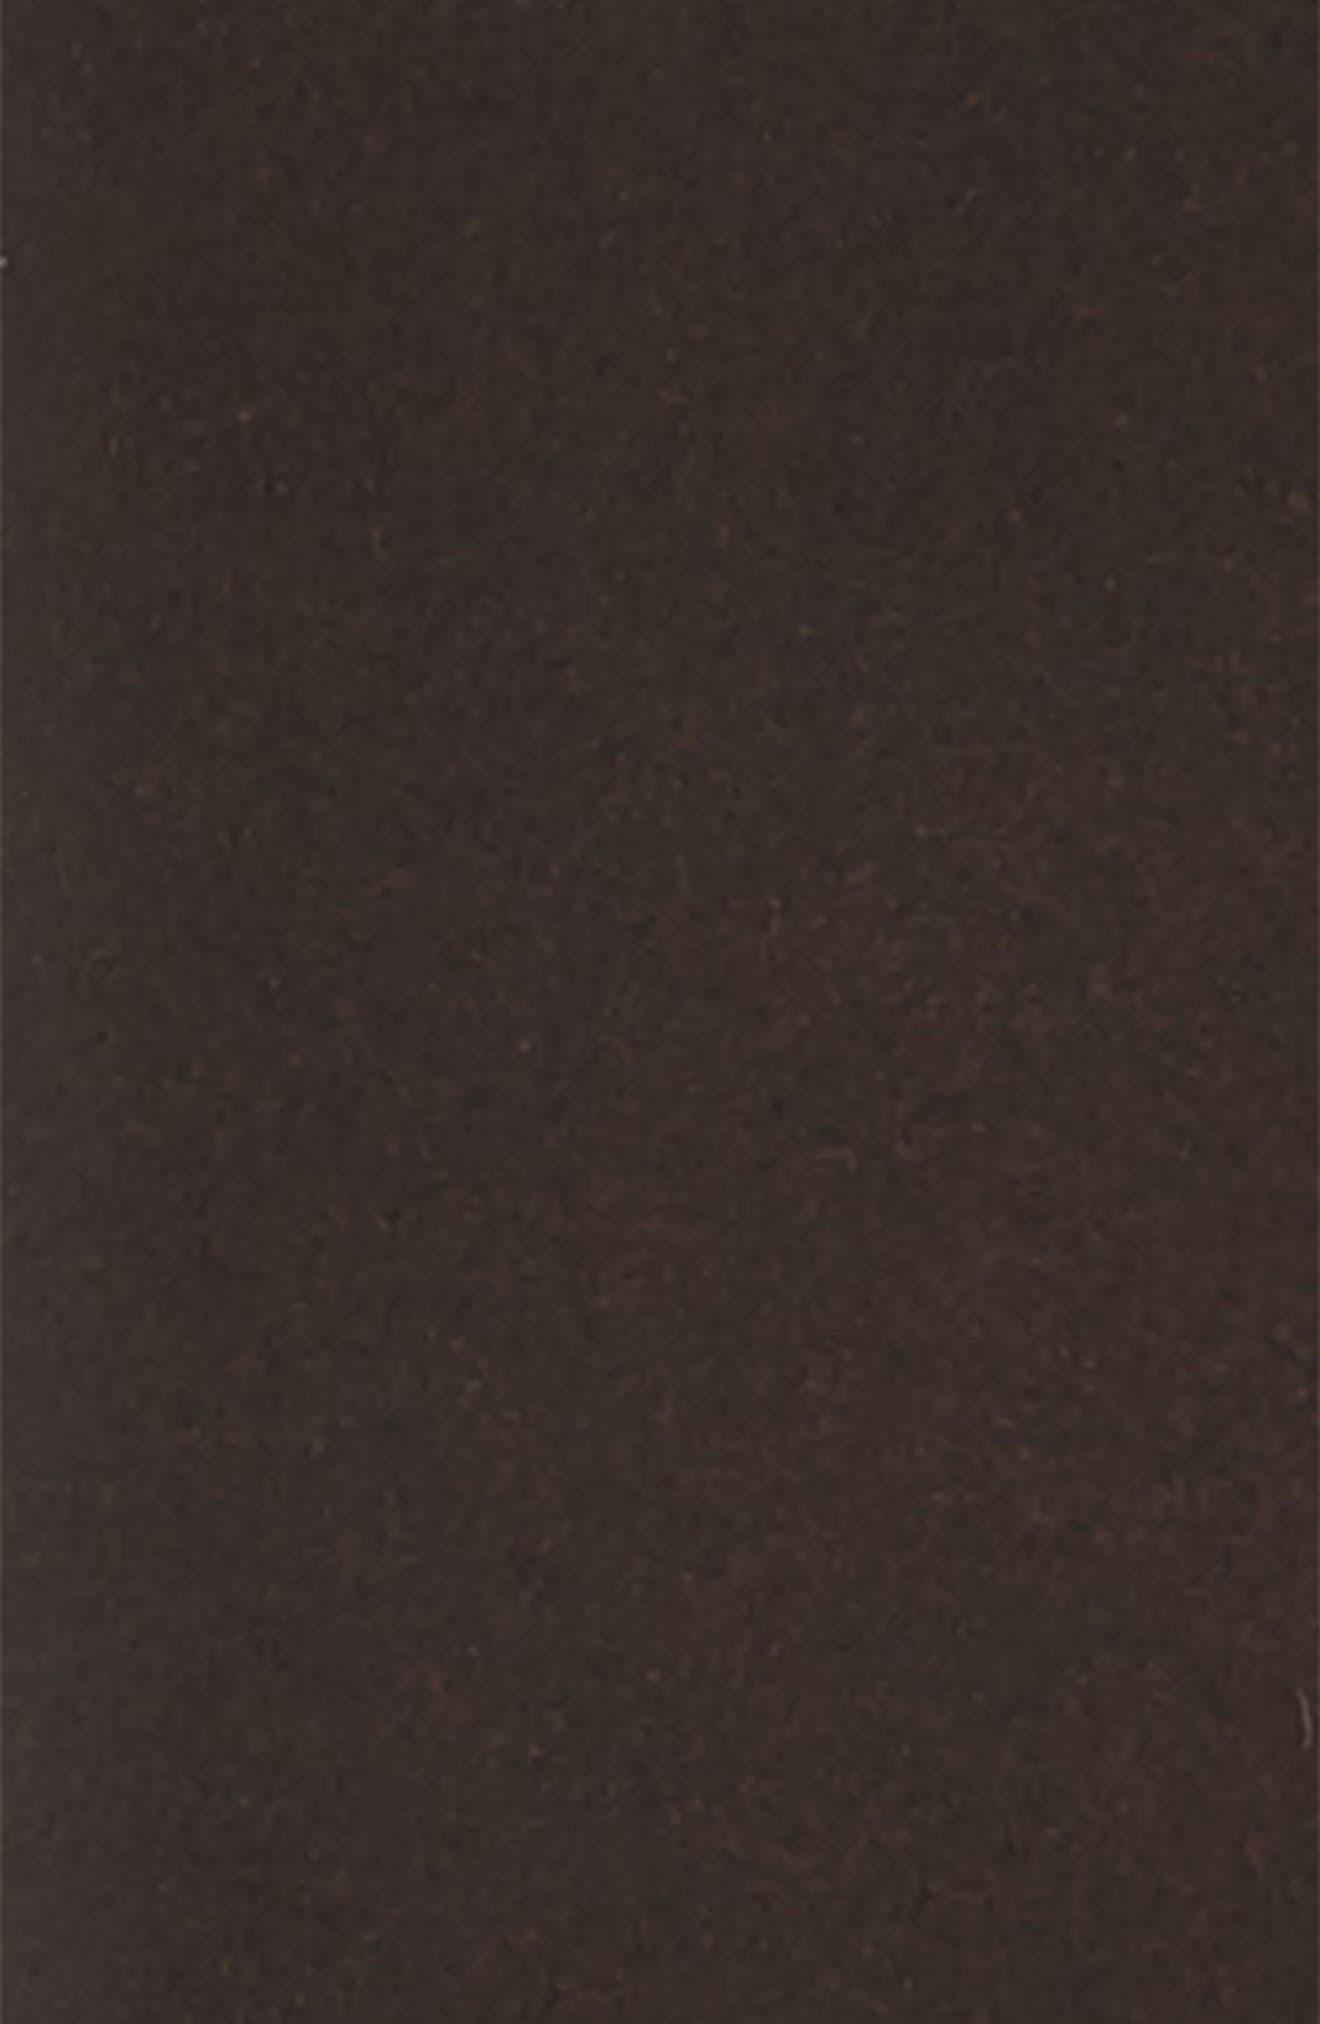 Reversible Leather Belt,                             Alternate thumbnail 3, color,                             AFRICA/ NERO